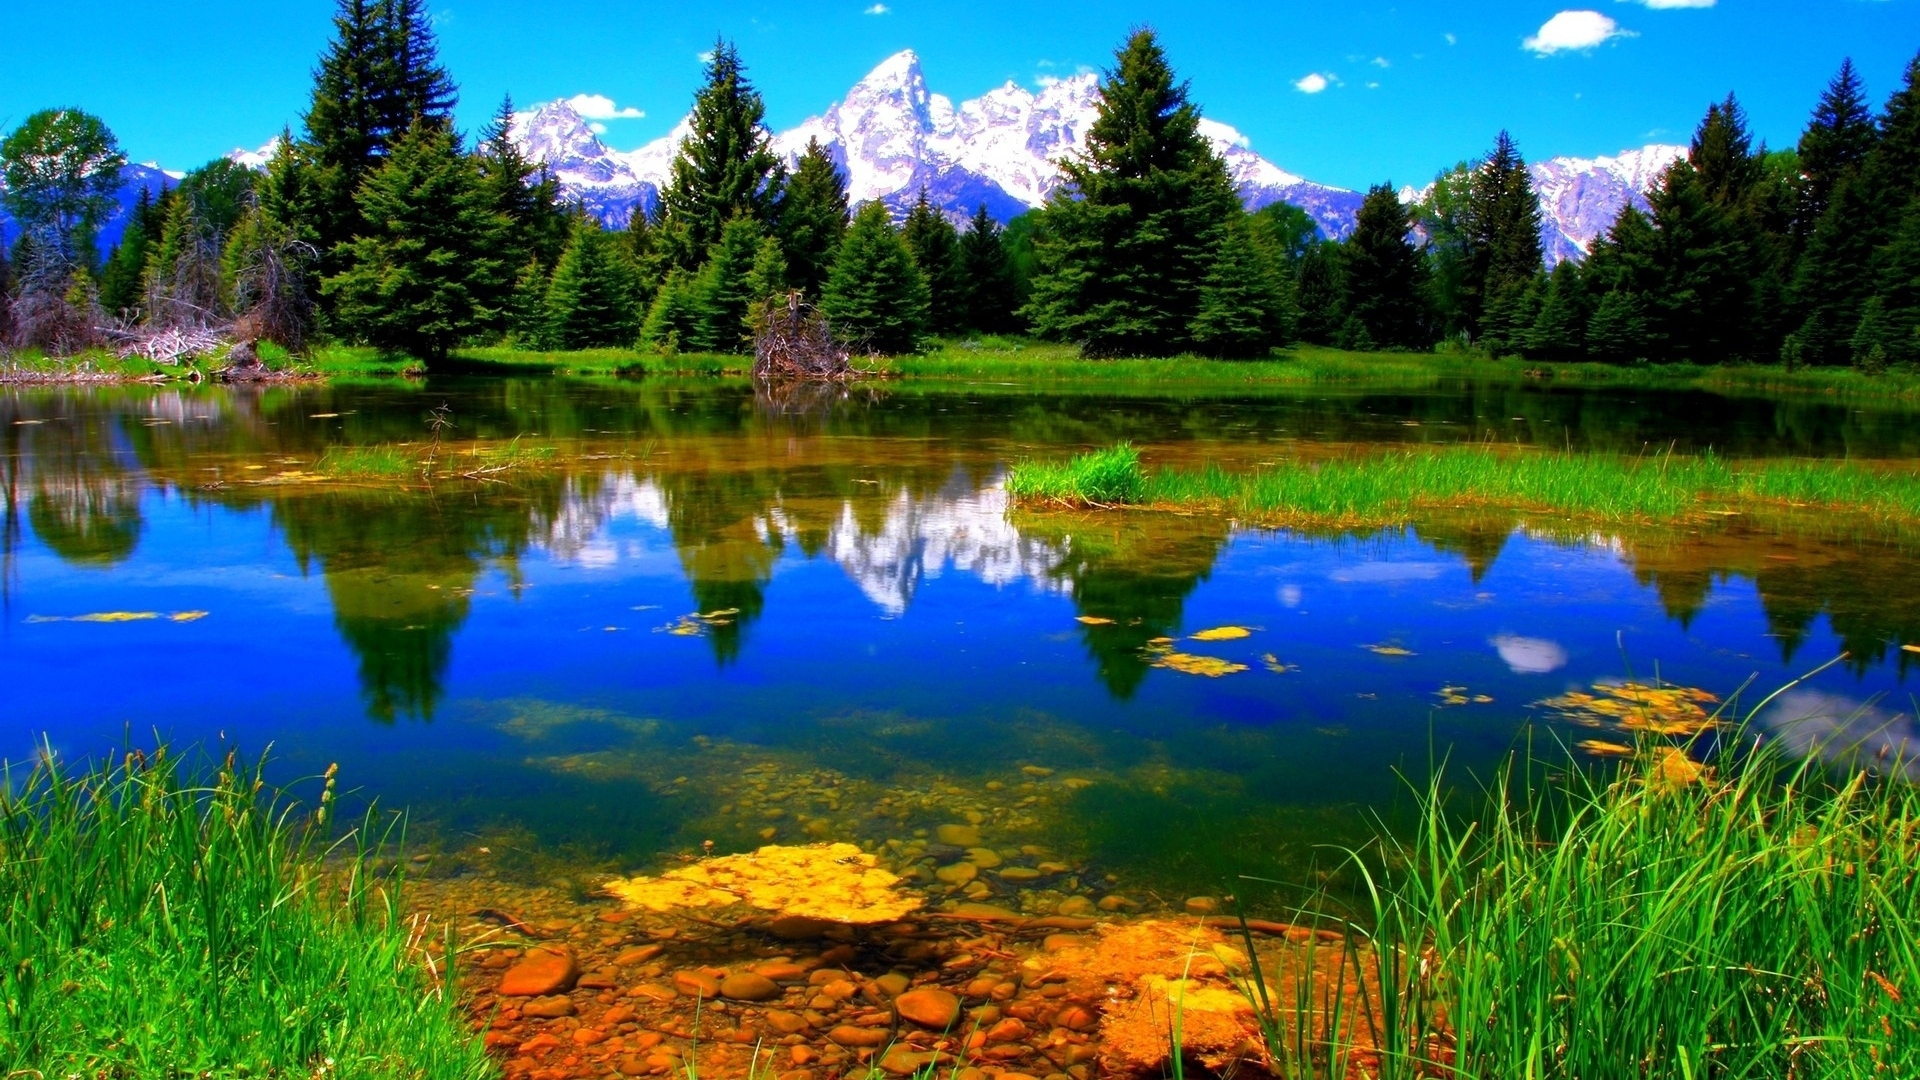 landscape hd wallpapers 1080p | wallpaper photography hd